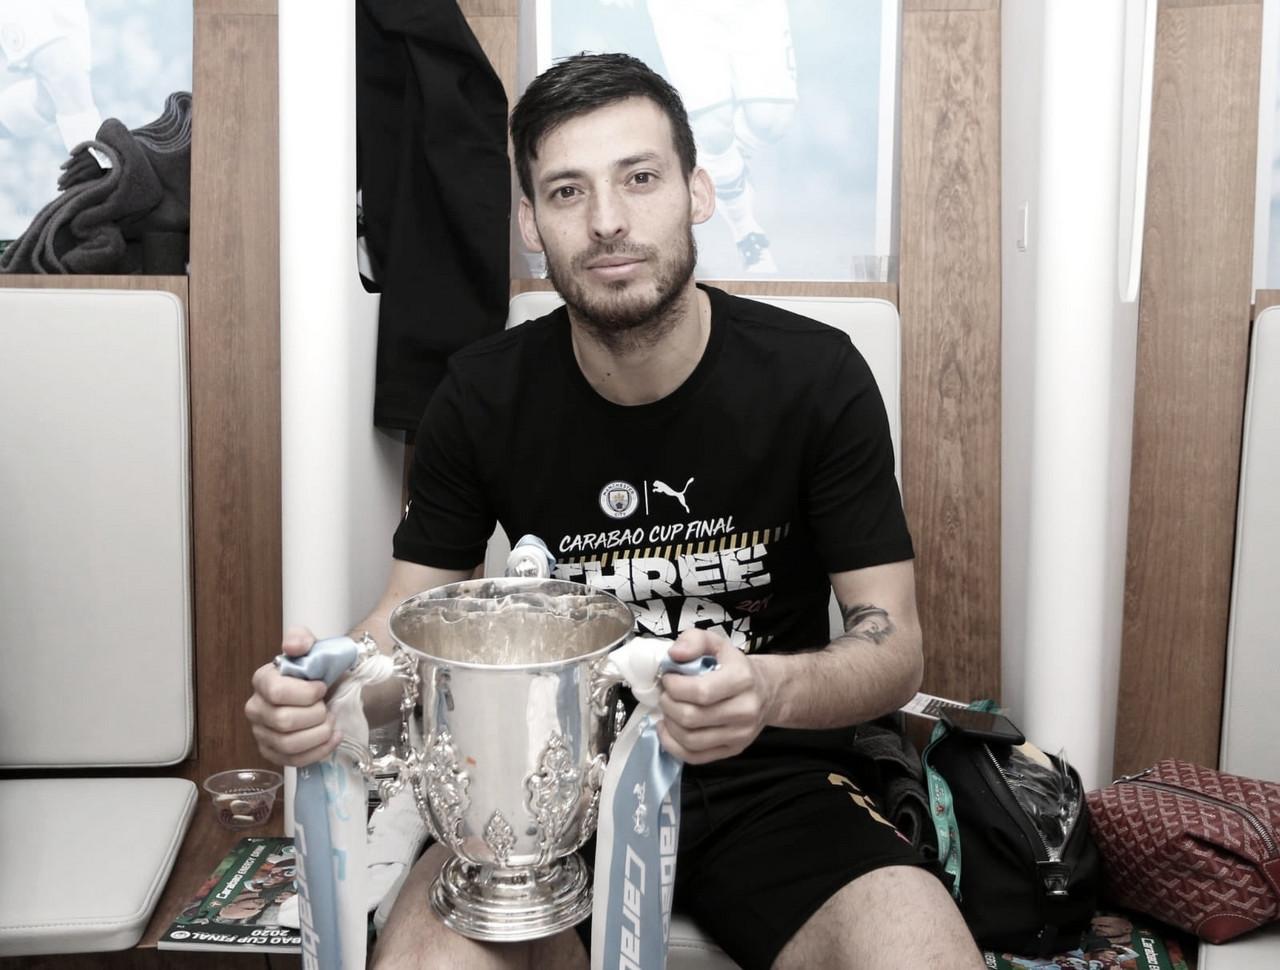 Real Sociedad surpreende e anuncia David Silva, ex-Manchester City